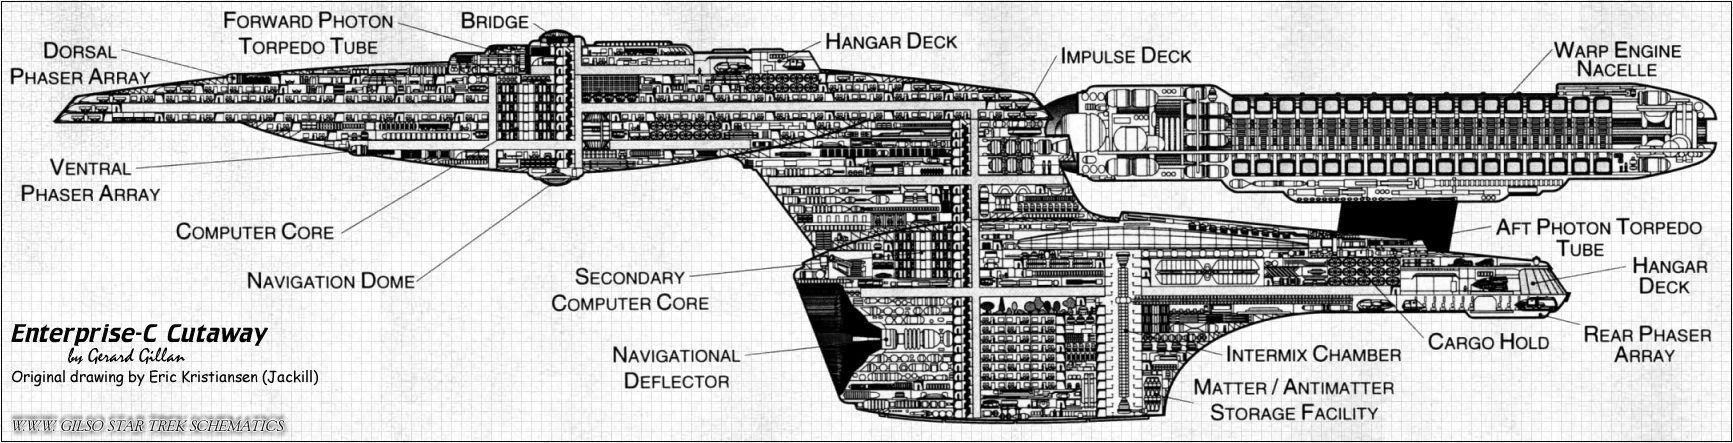 u s s enterprise ncc 1701 c cutaway star trek star trek star